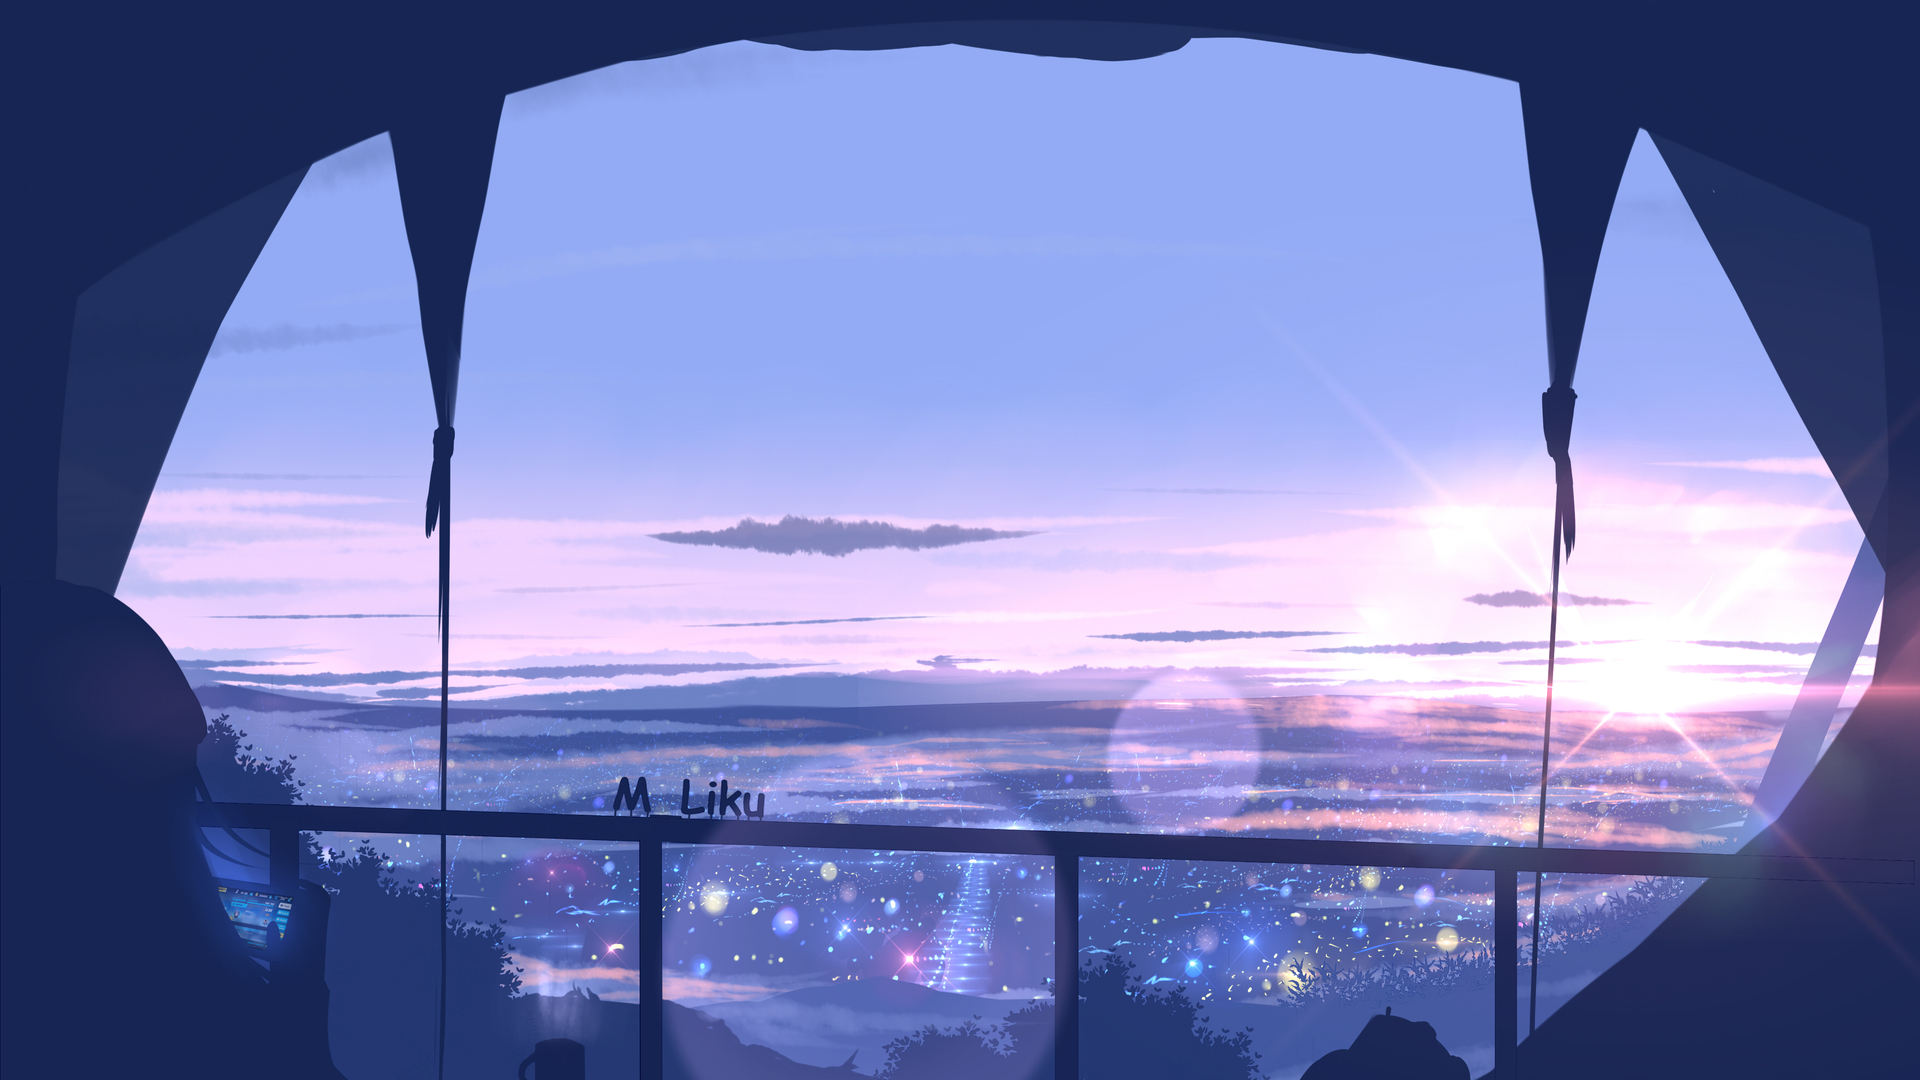 1920x1080 Scenery View From Window Anime 4k Laptop Full HD ...